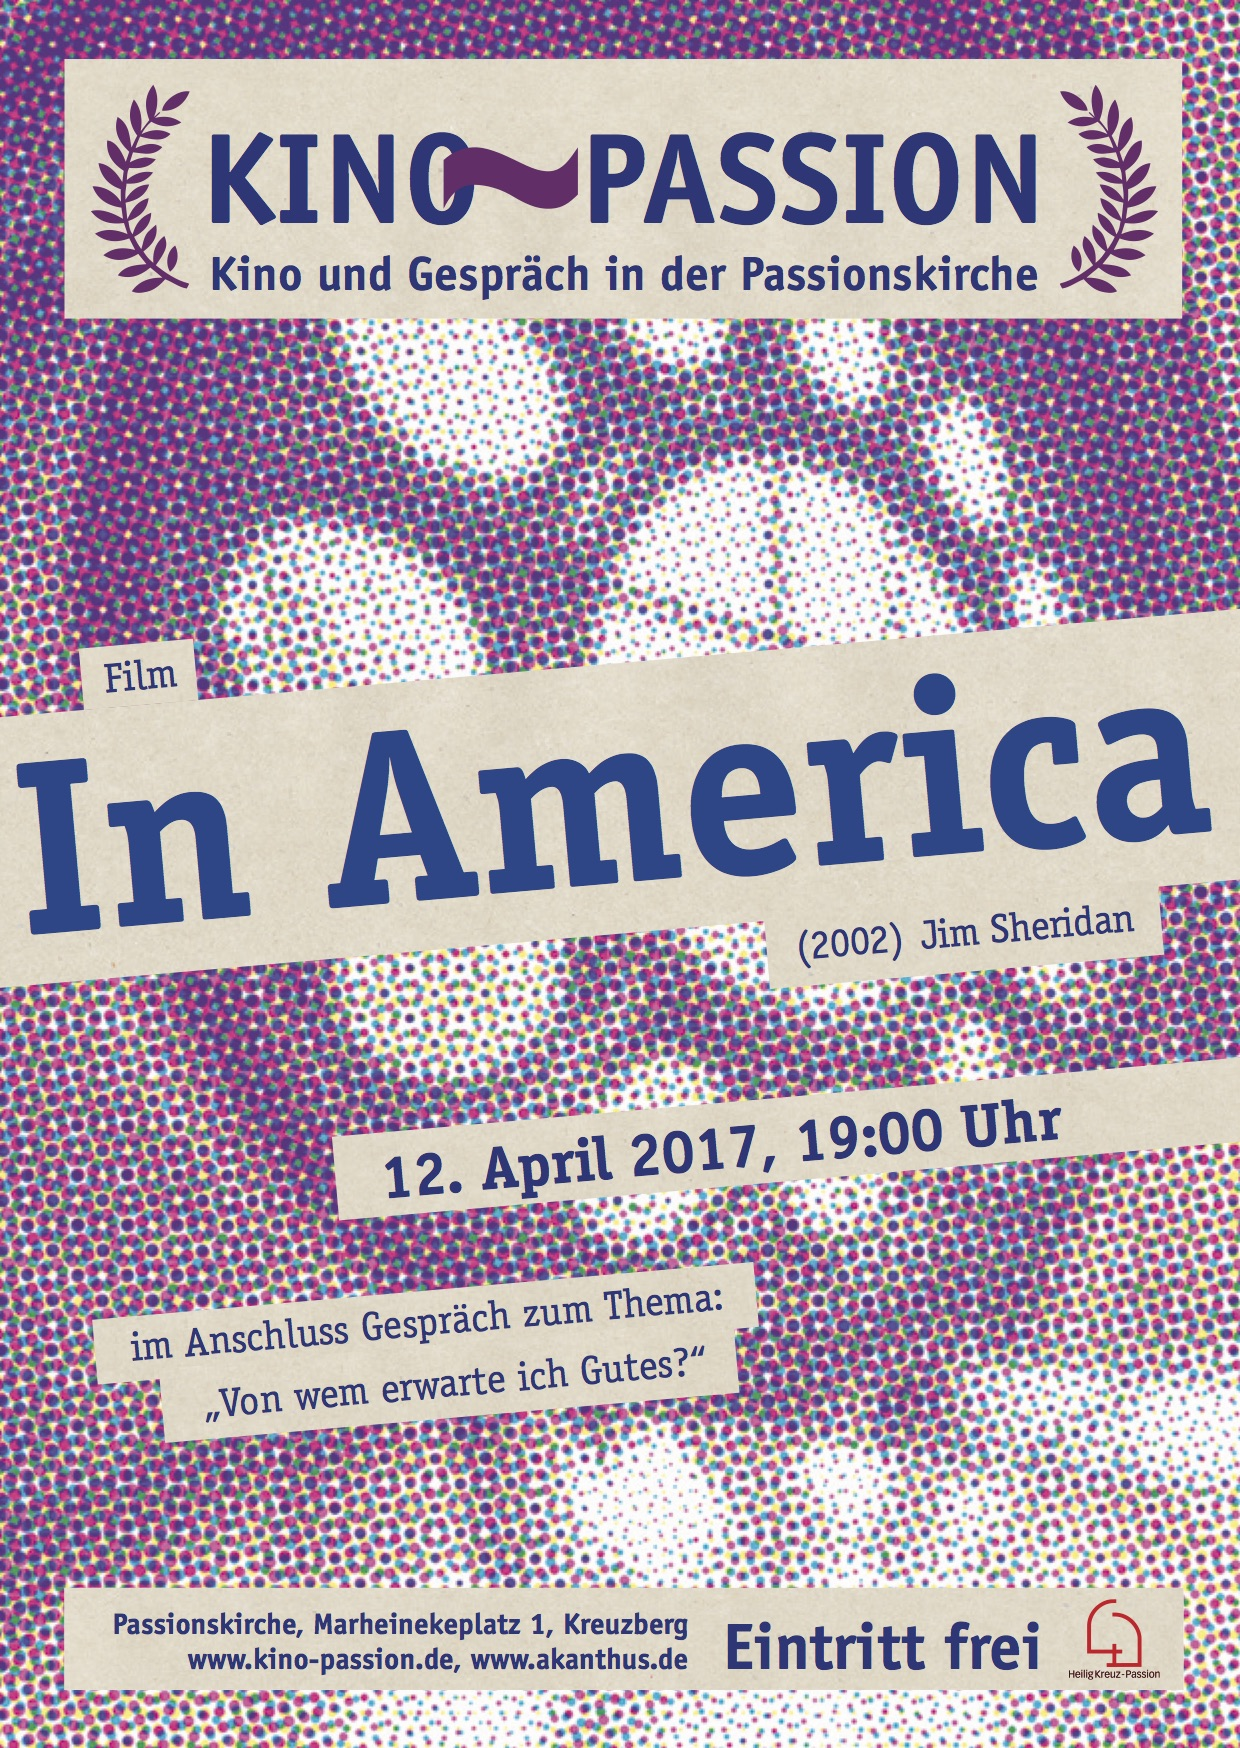 75_KIno_passion_In America.jpg